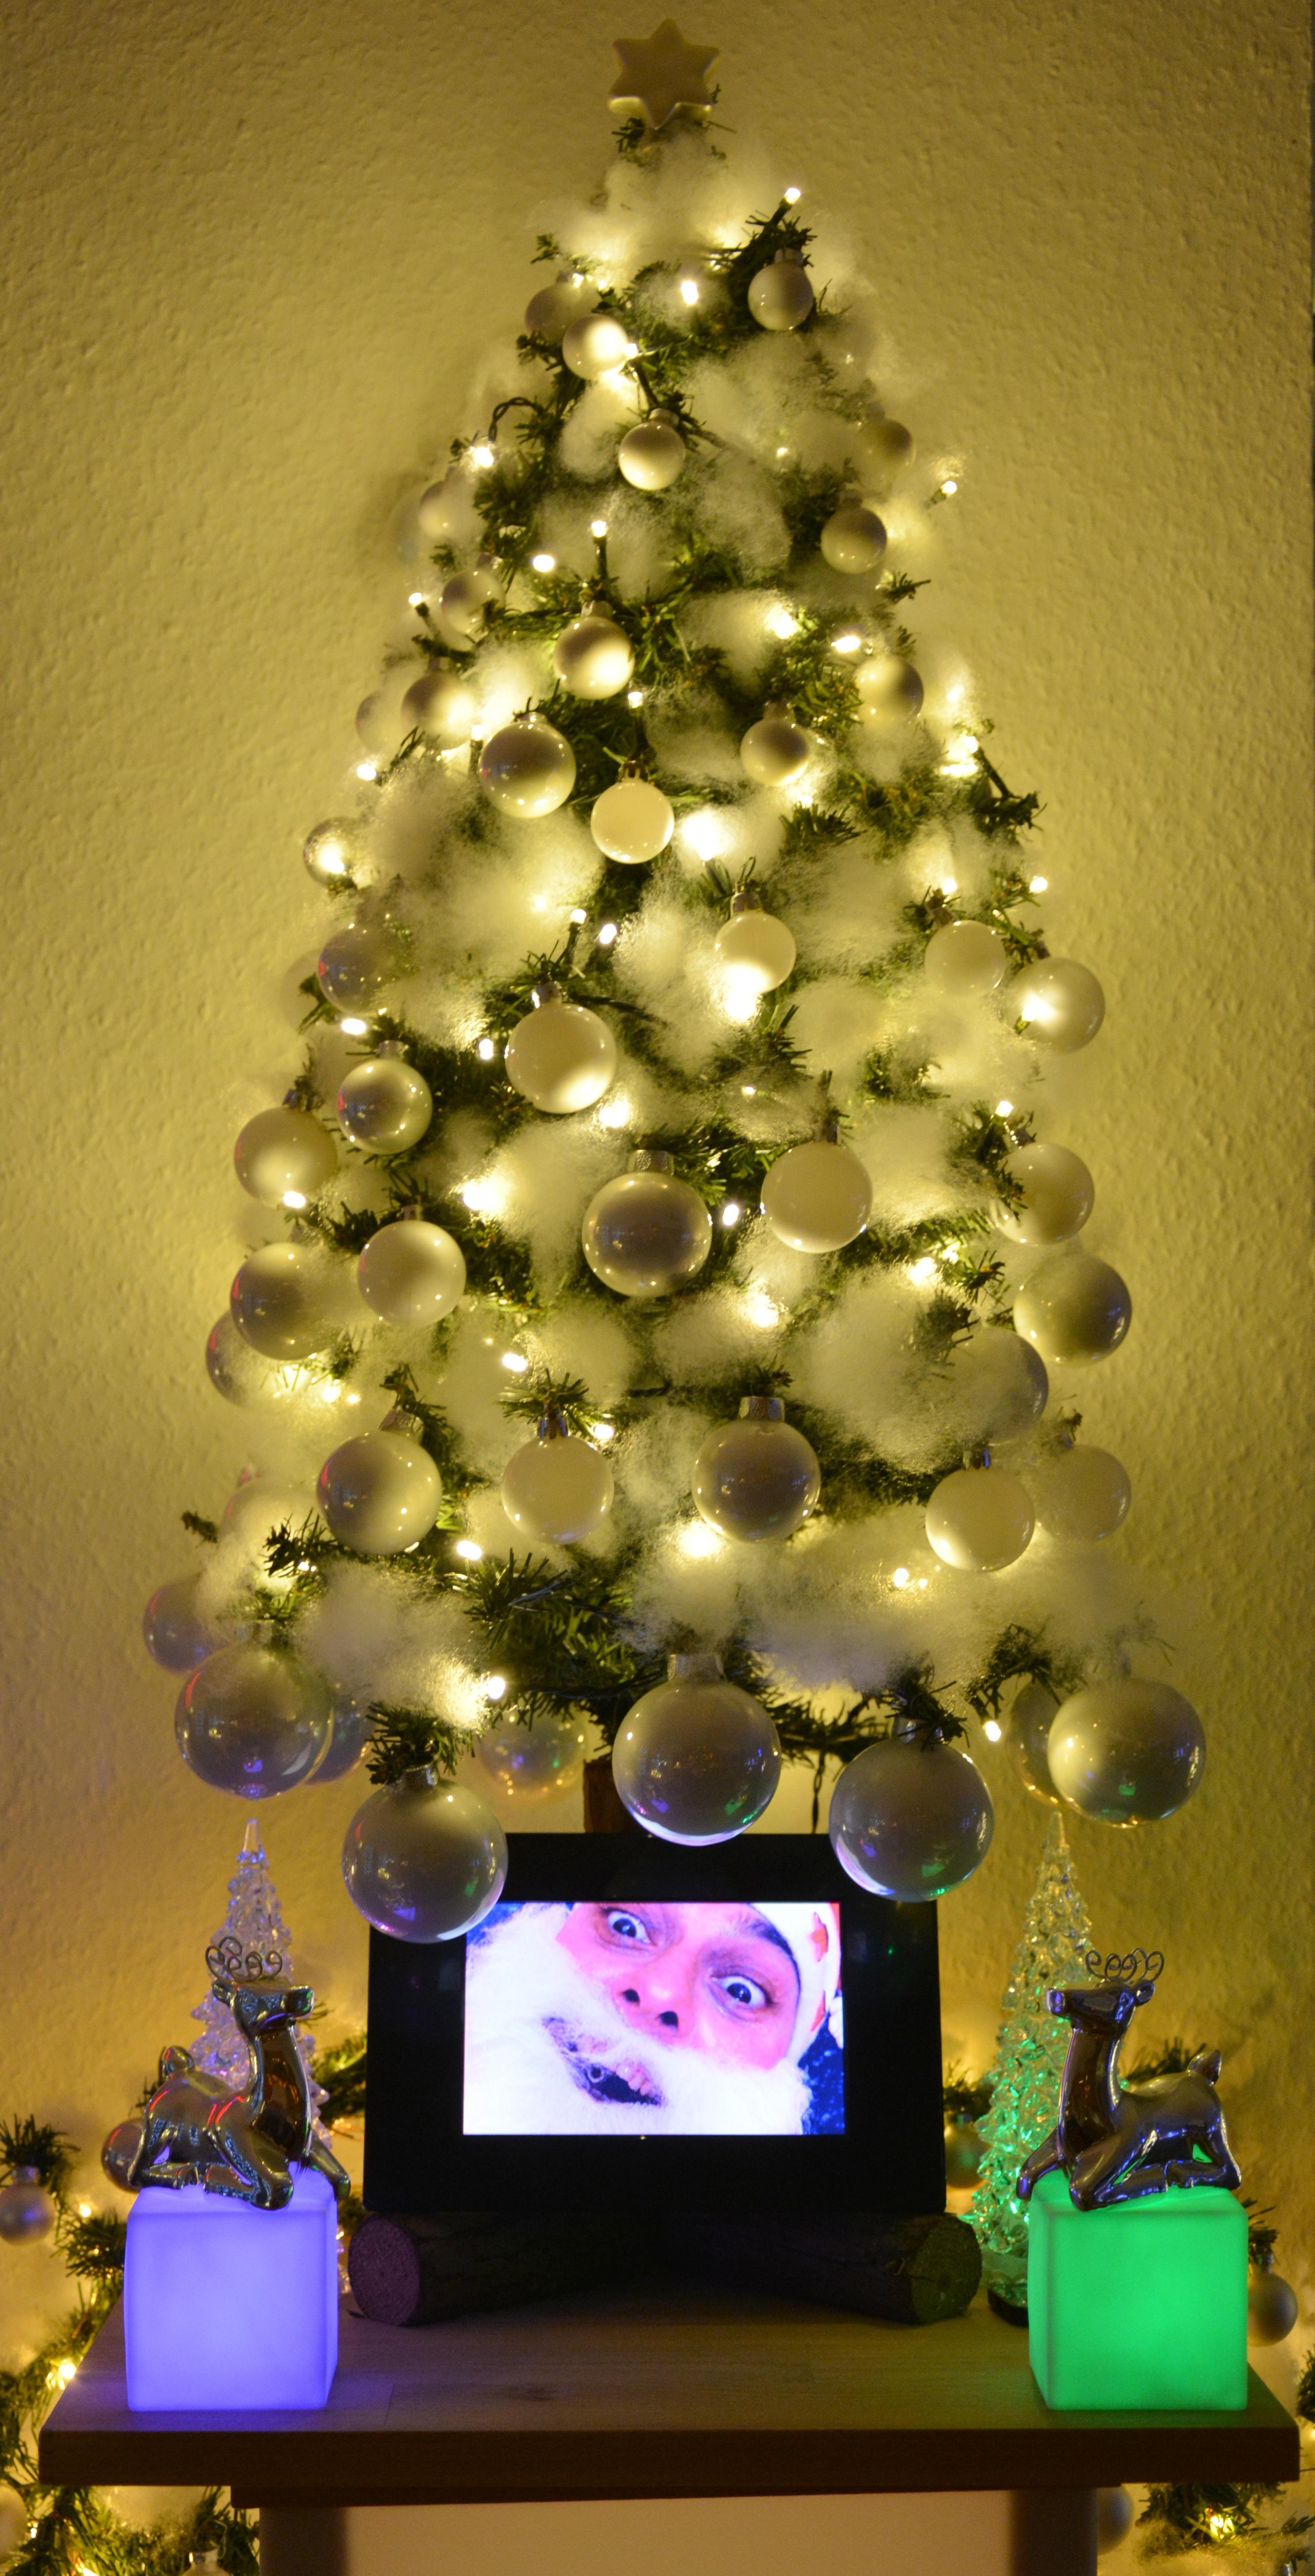 Free Images Snow Flower Atmosphere Lighting Christmas Tree